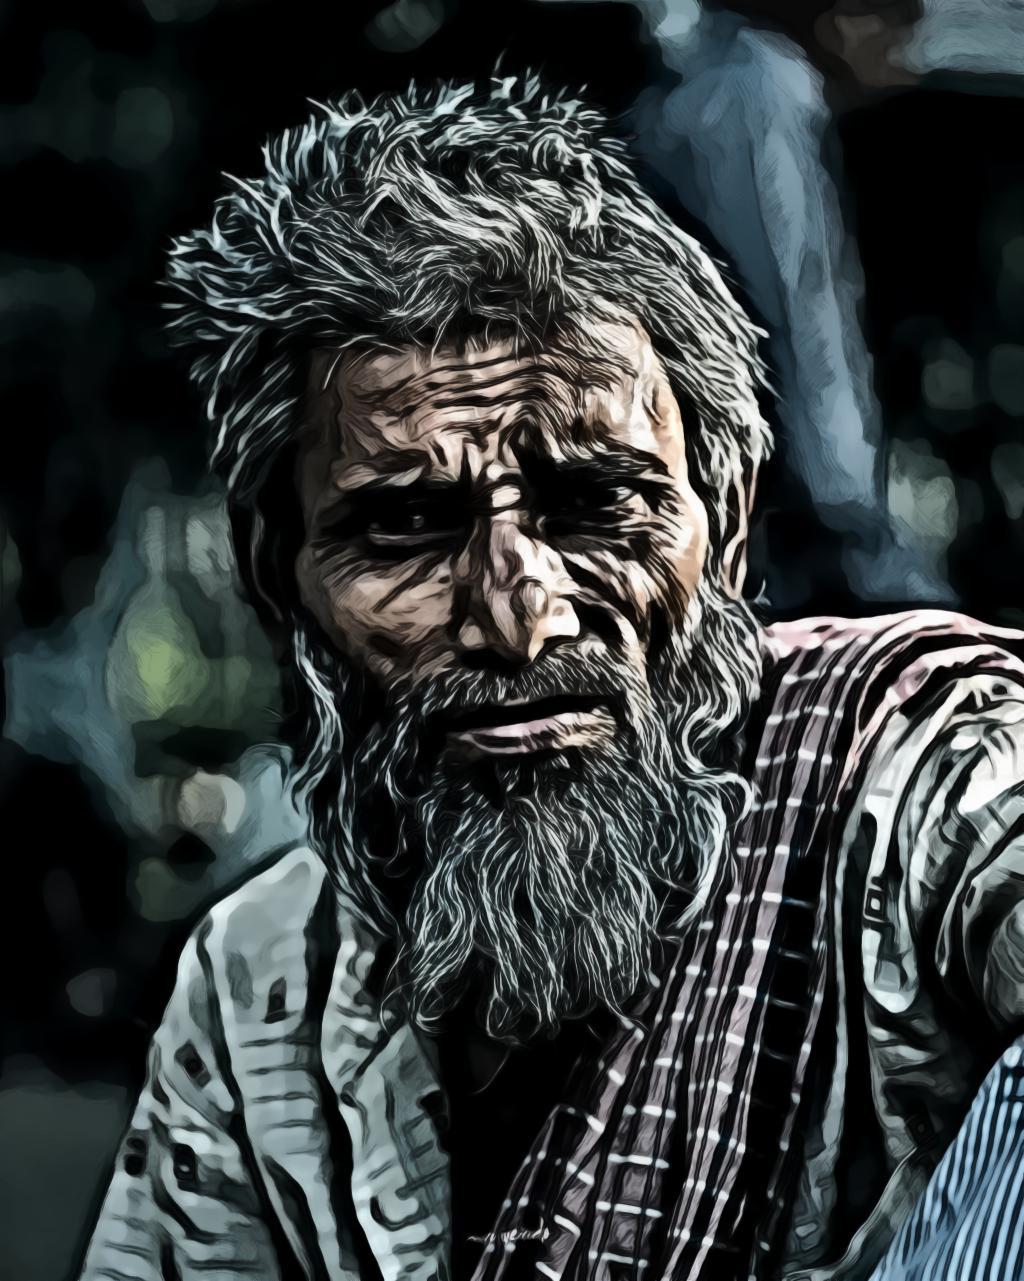 Aged beard elder man